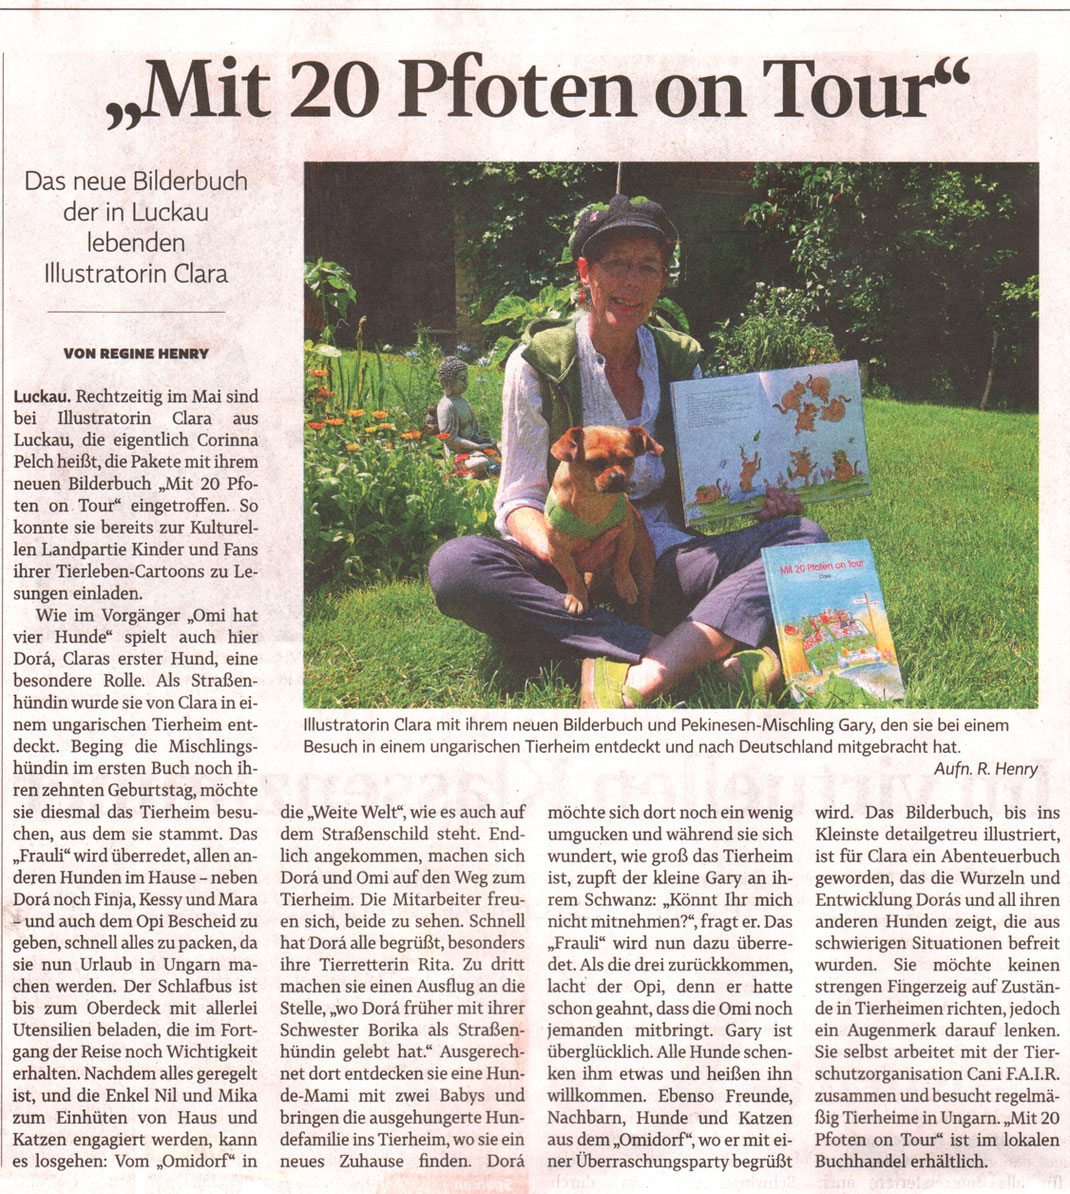 Regine Henry, Elbe-Jeetzel-Zeitung vom 27. Juni 2019